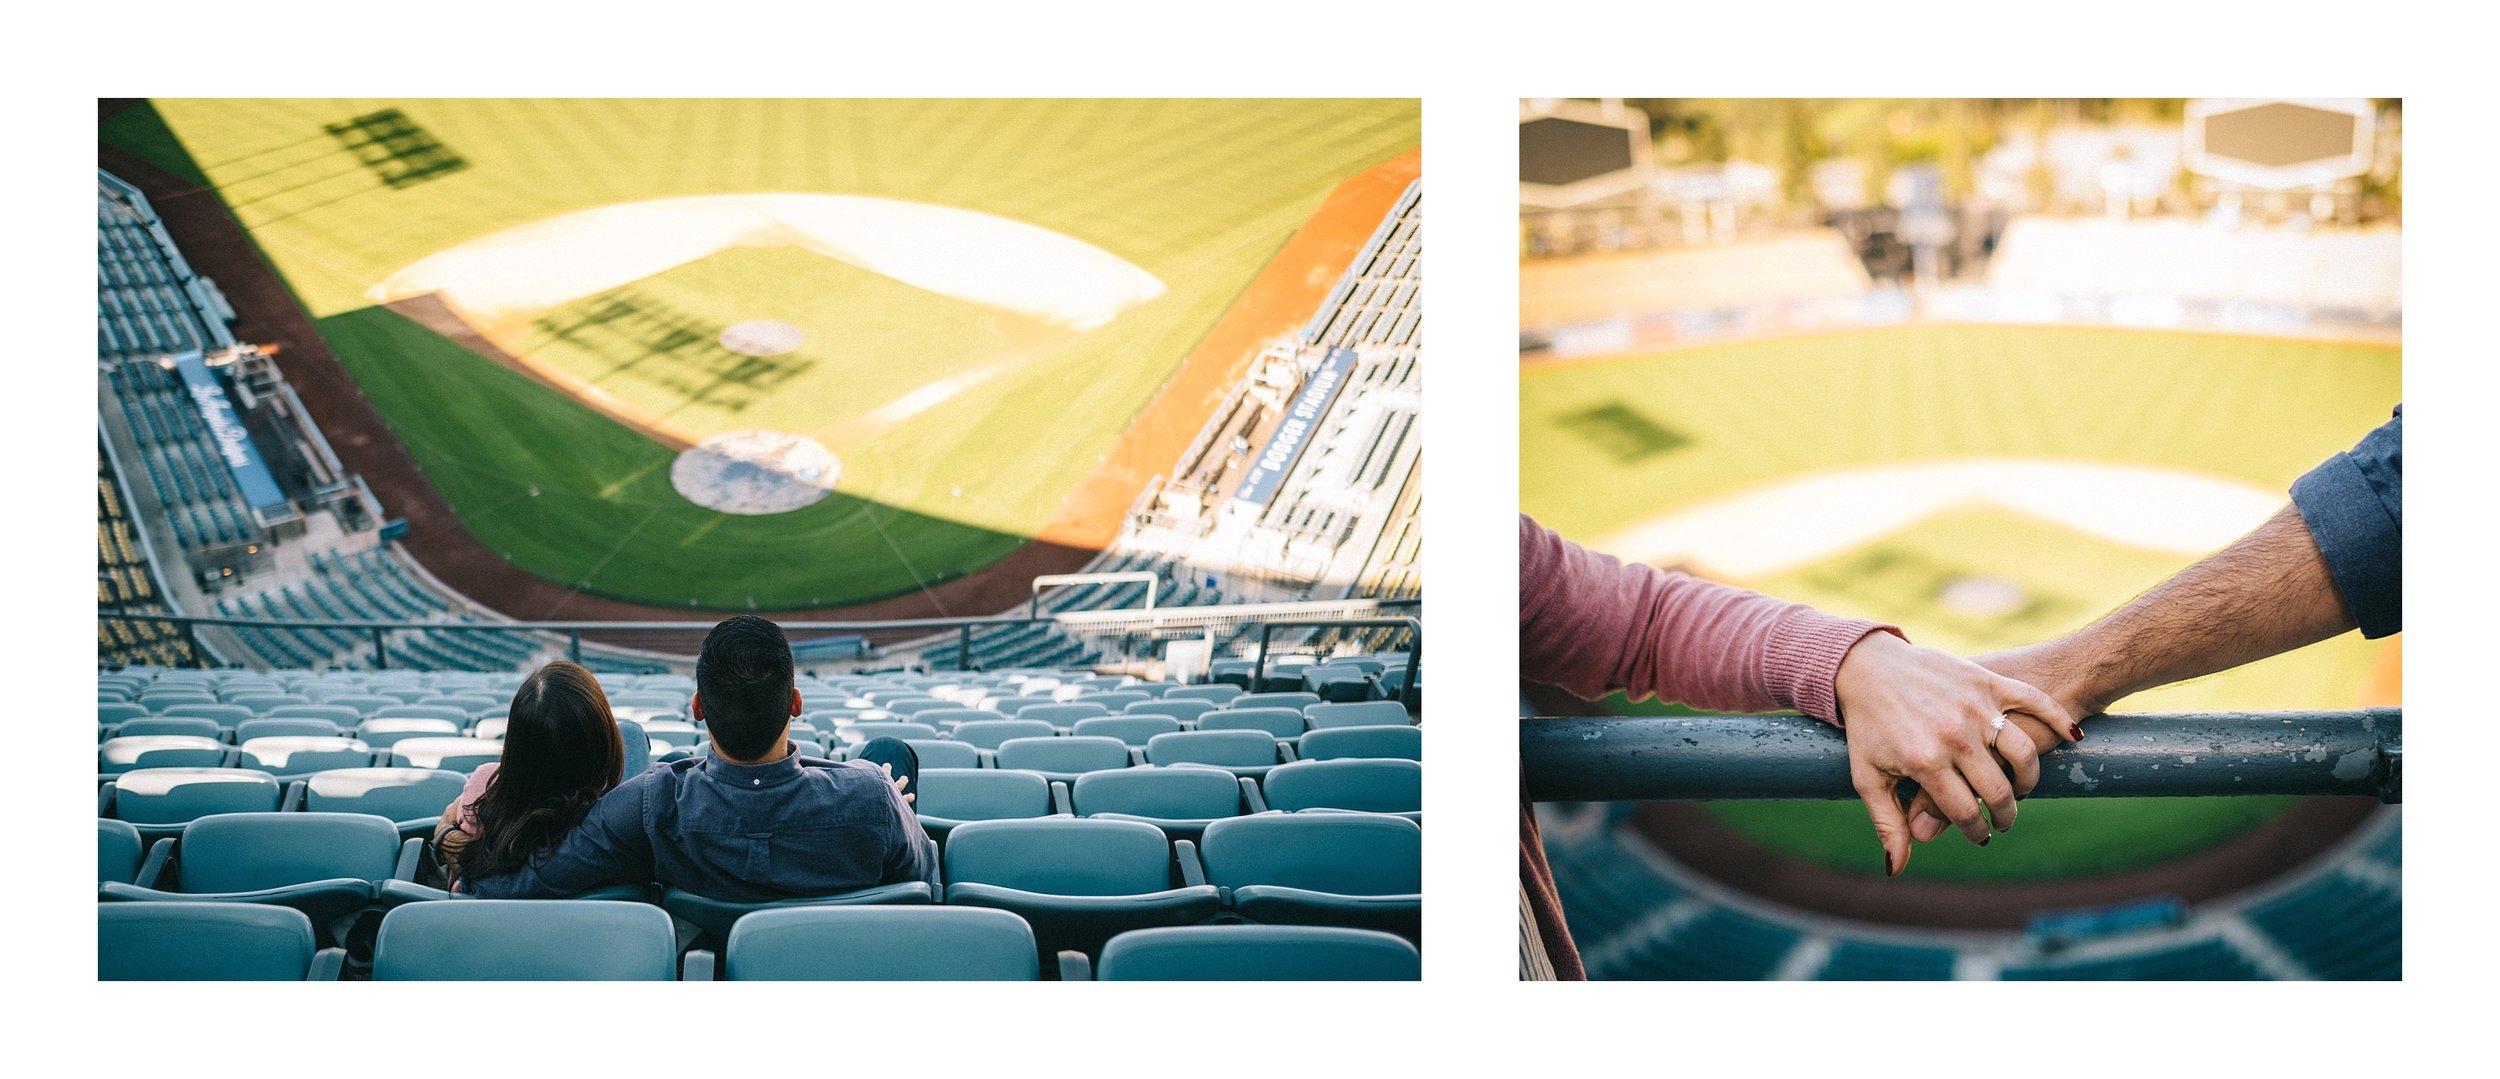 Dodger_Stadium_Engagement_Session_Nick_Mueller_Photography_3.jpg